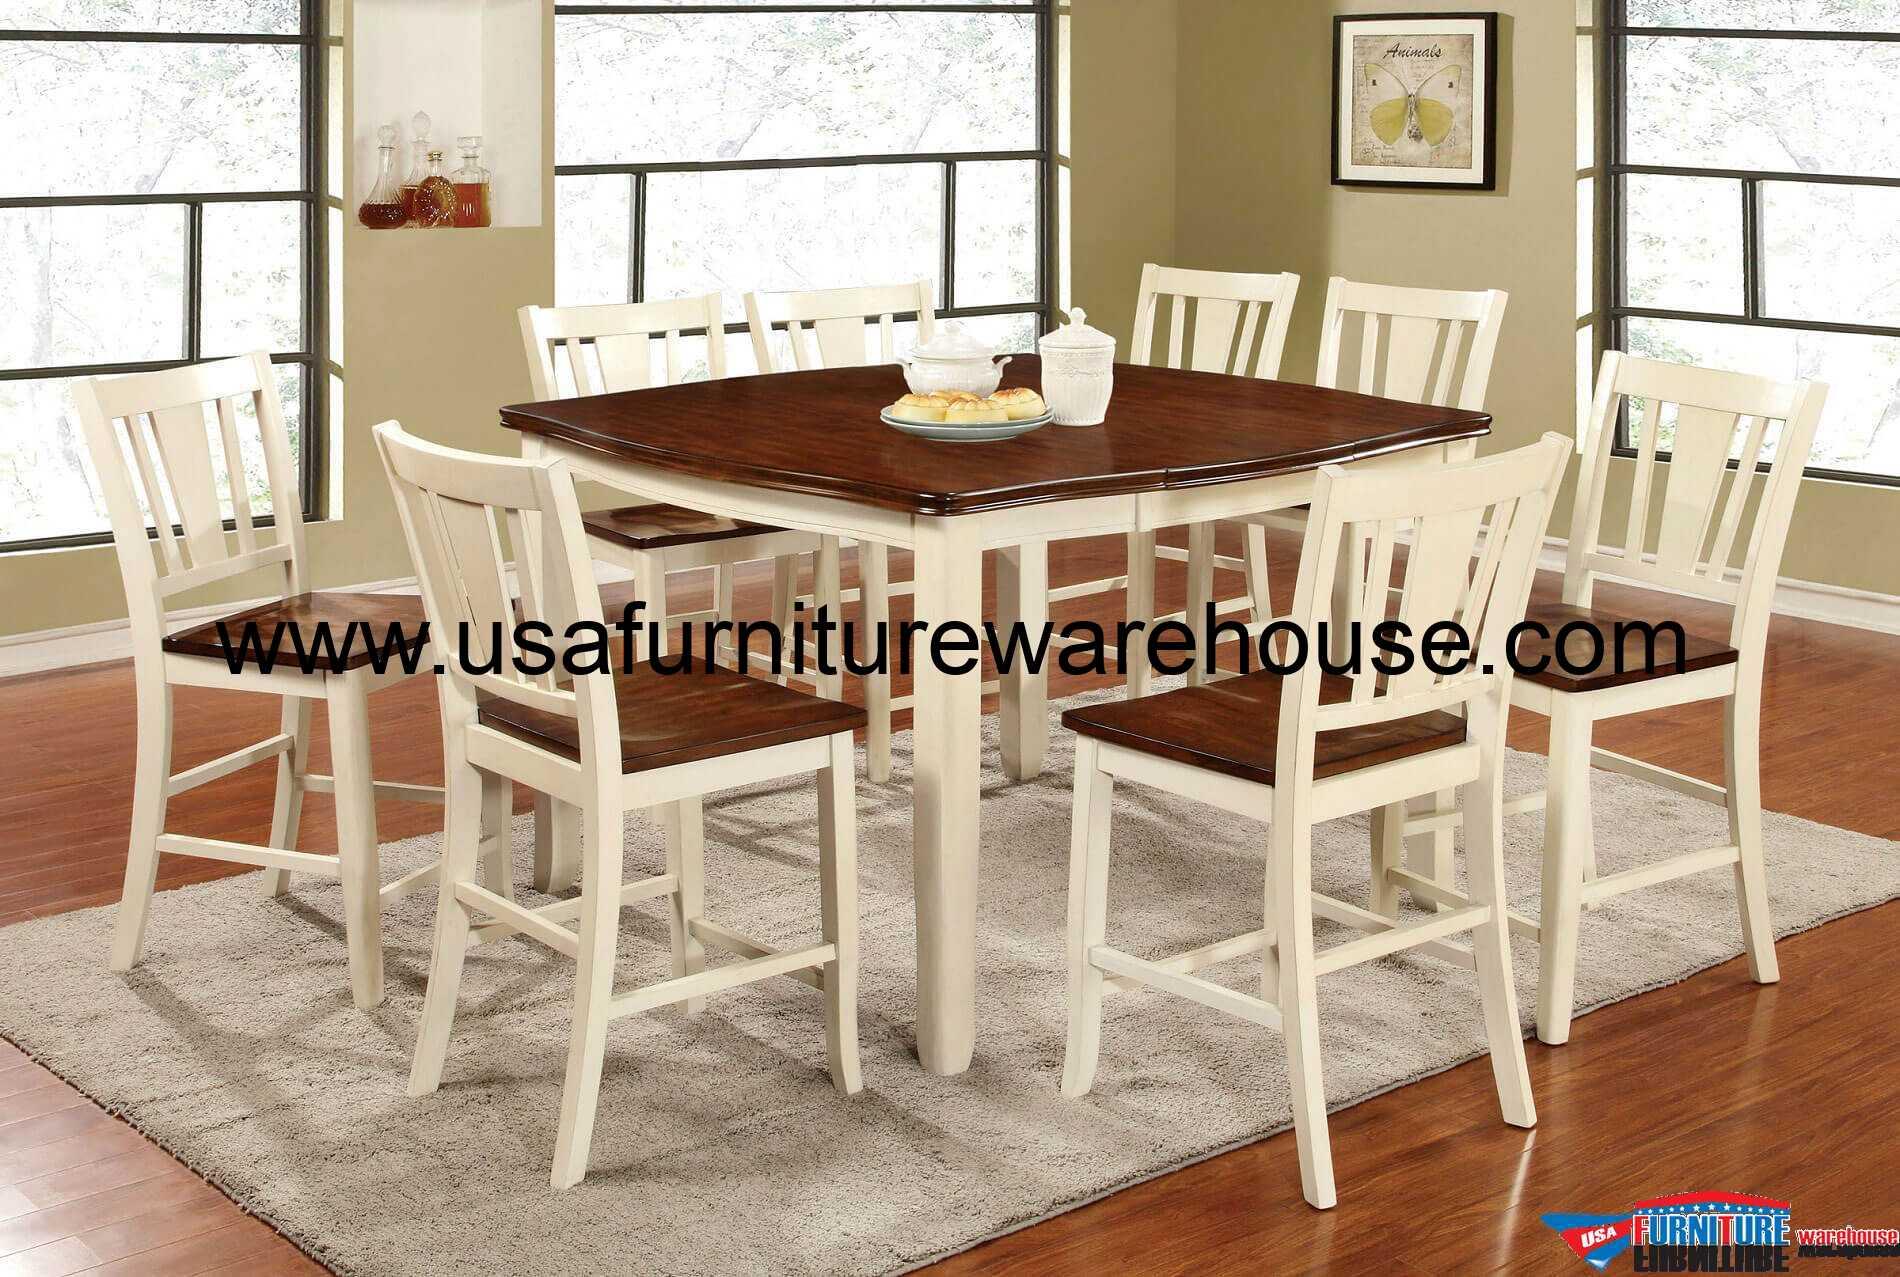 Genial USA Furniture Warehouse